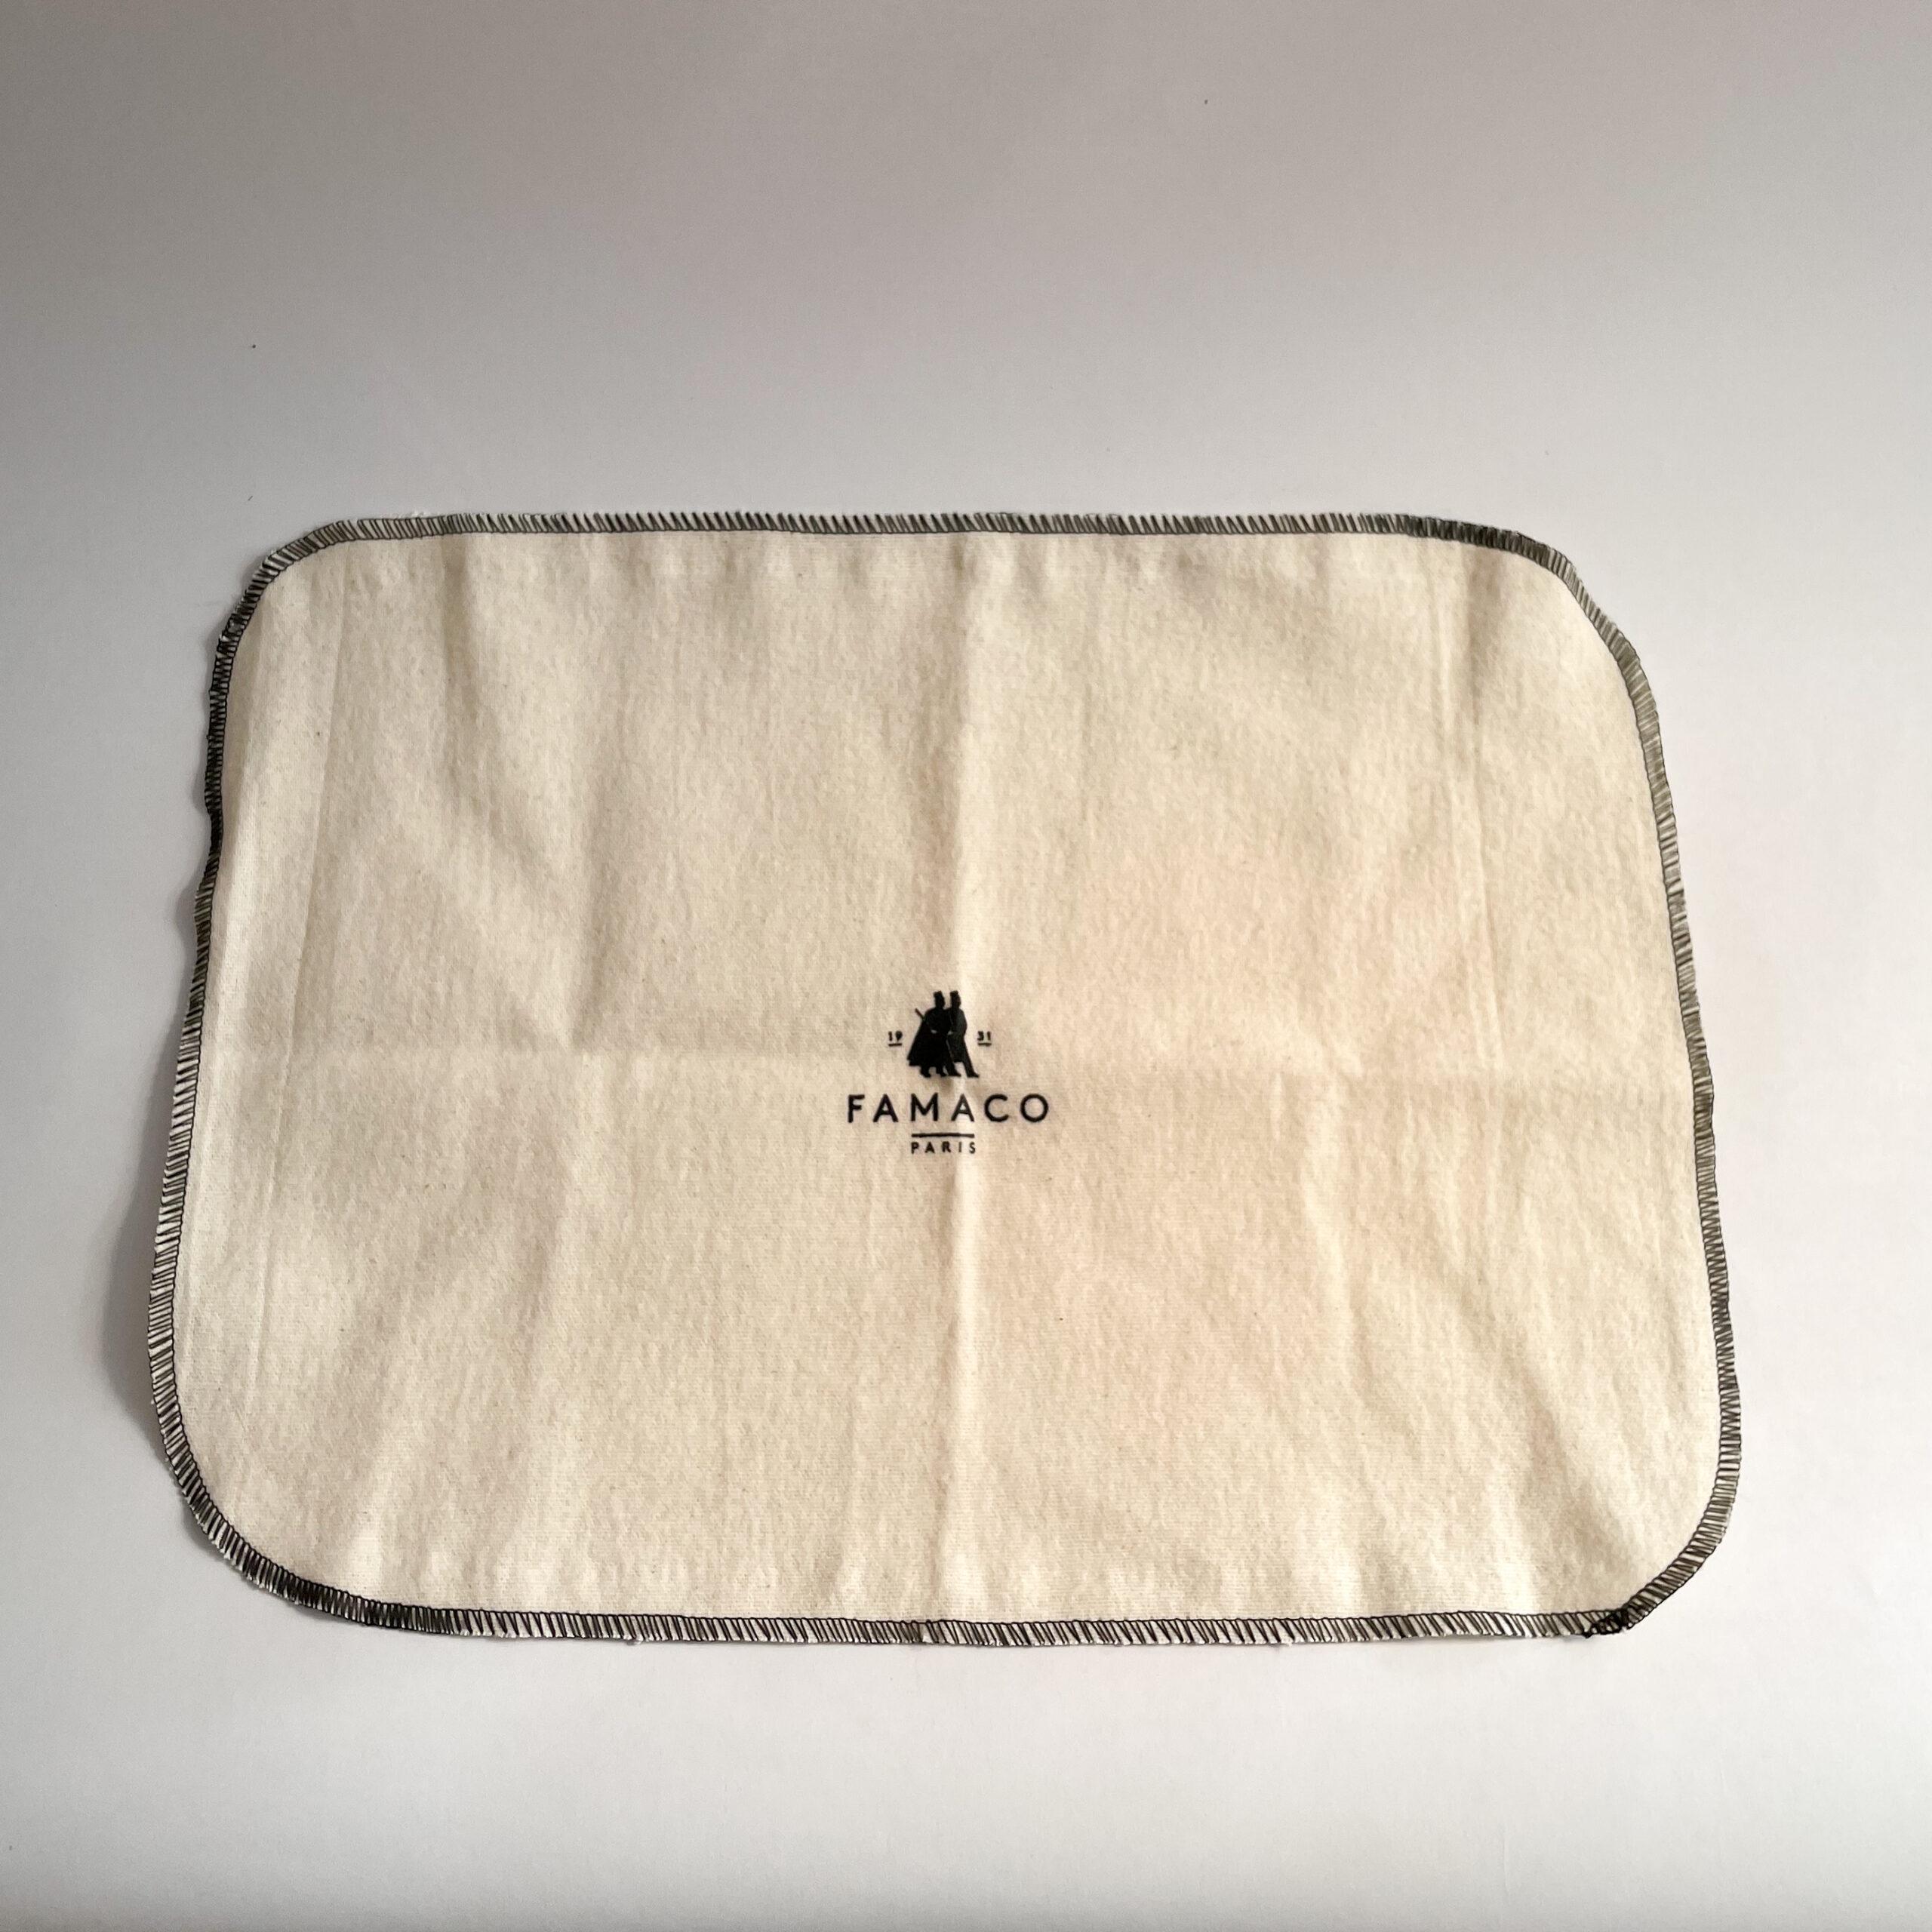 A single Famaco shine cloth